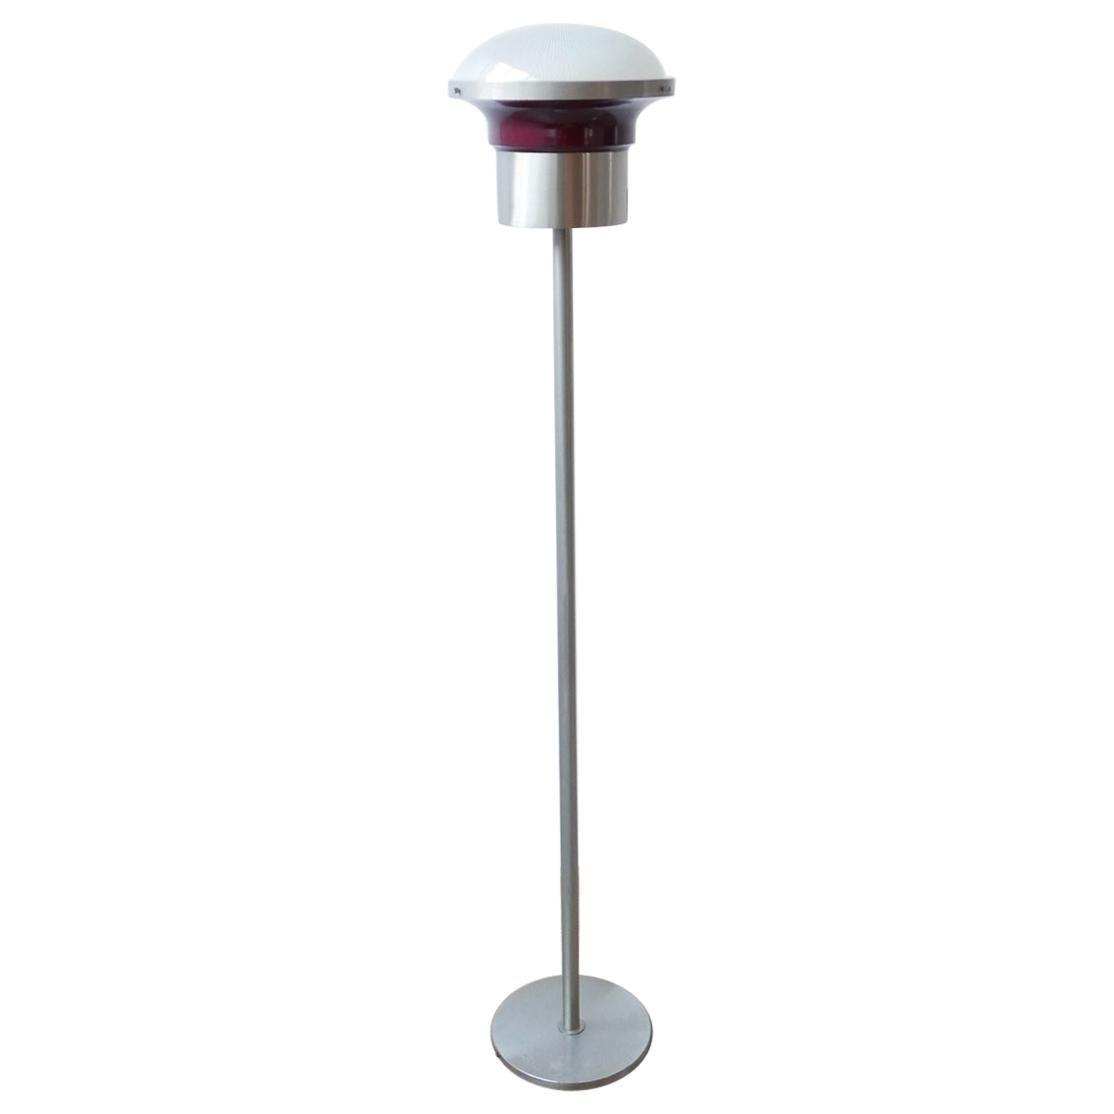 Sergio Mazza 'Tau' Midcentury Italian Floor Lamp